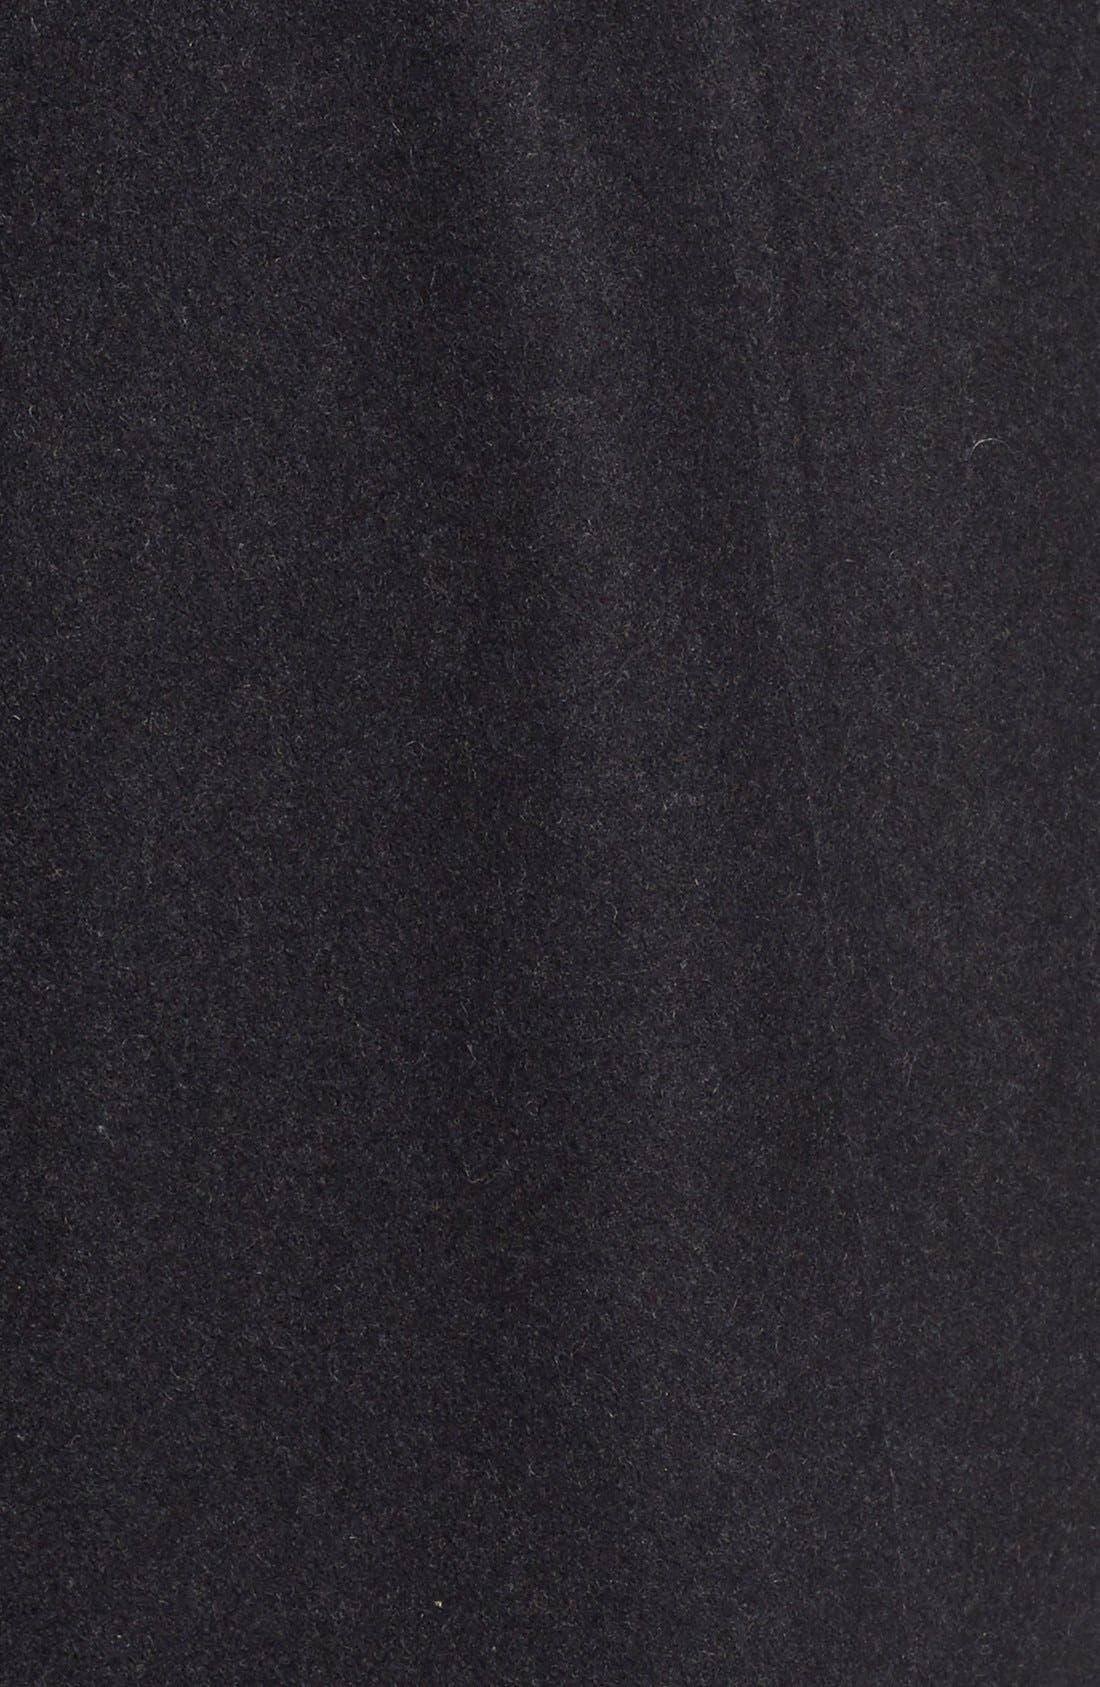 Faux Leather & Faux Fur Trim Belted Wool Blend Coat,                             Alternate thumbnail 20, color,